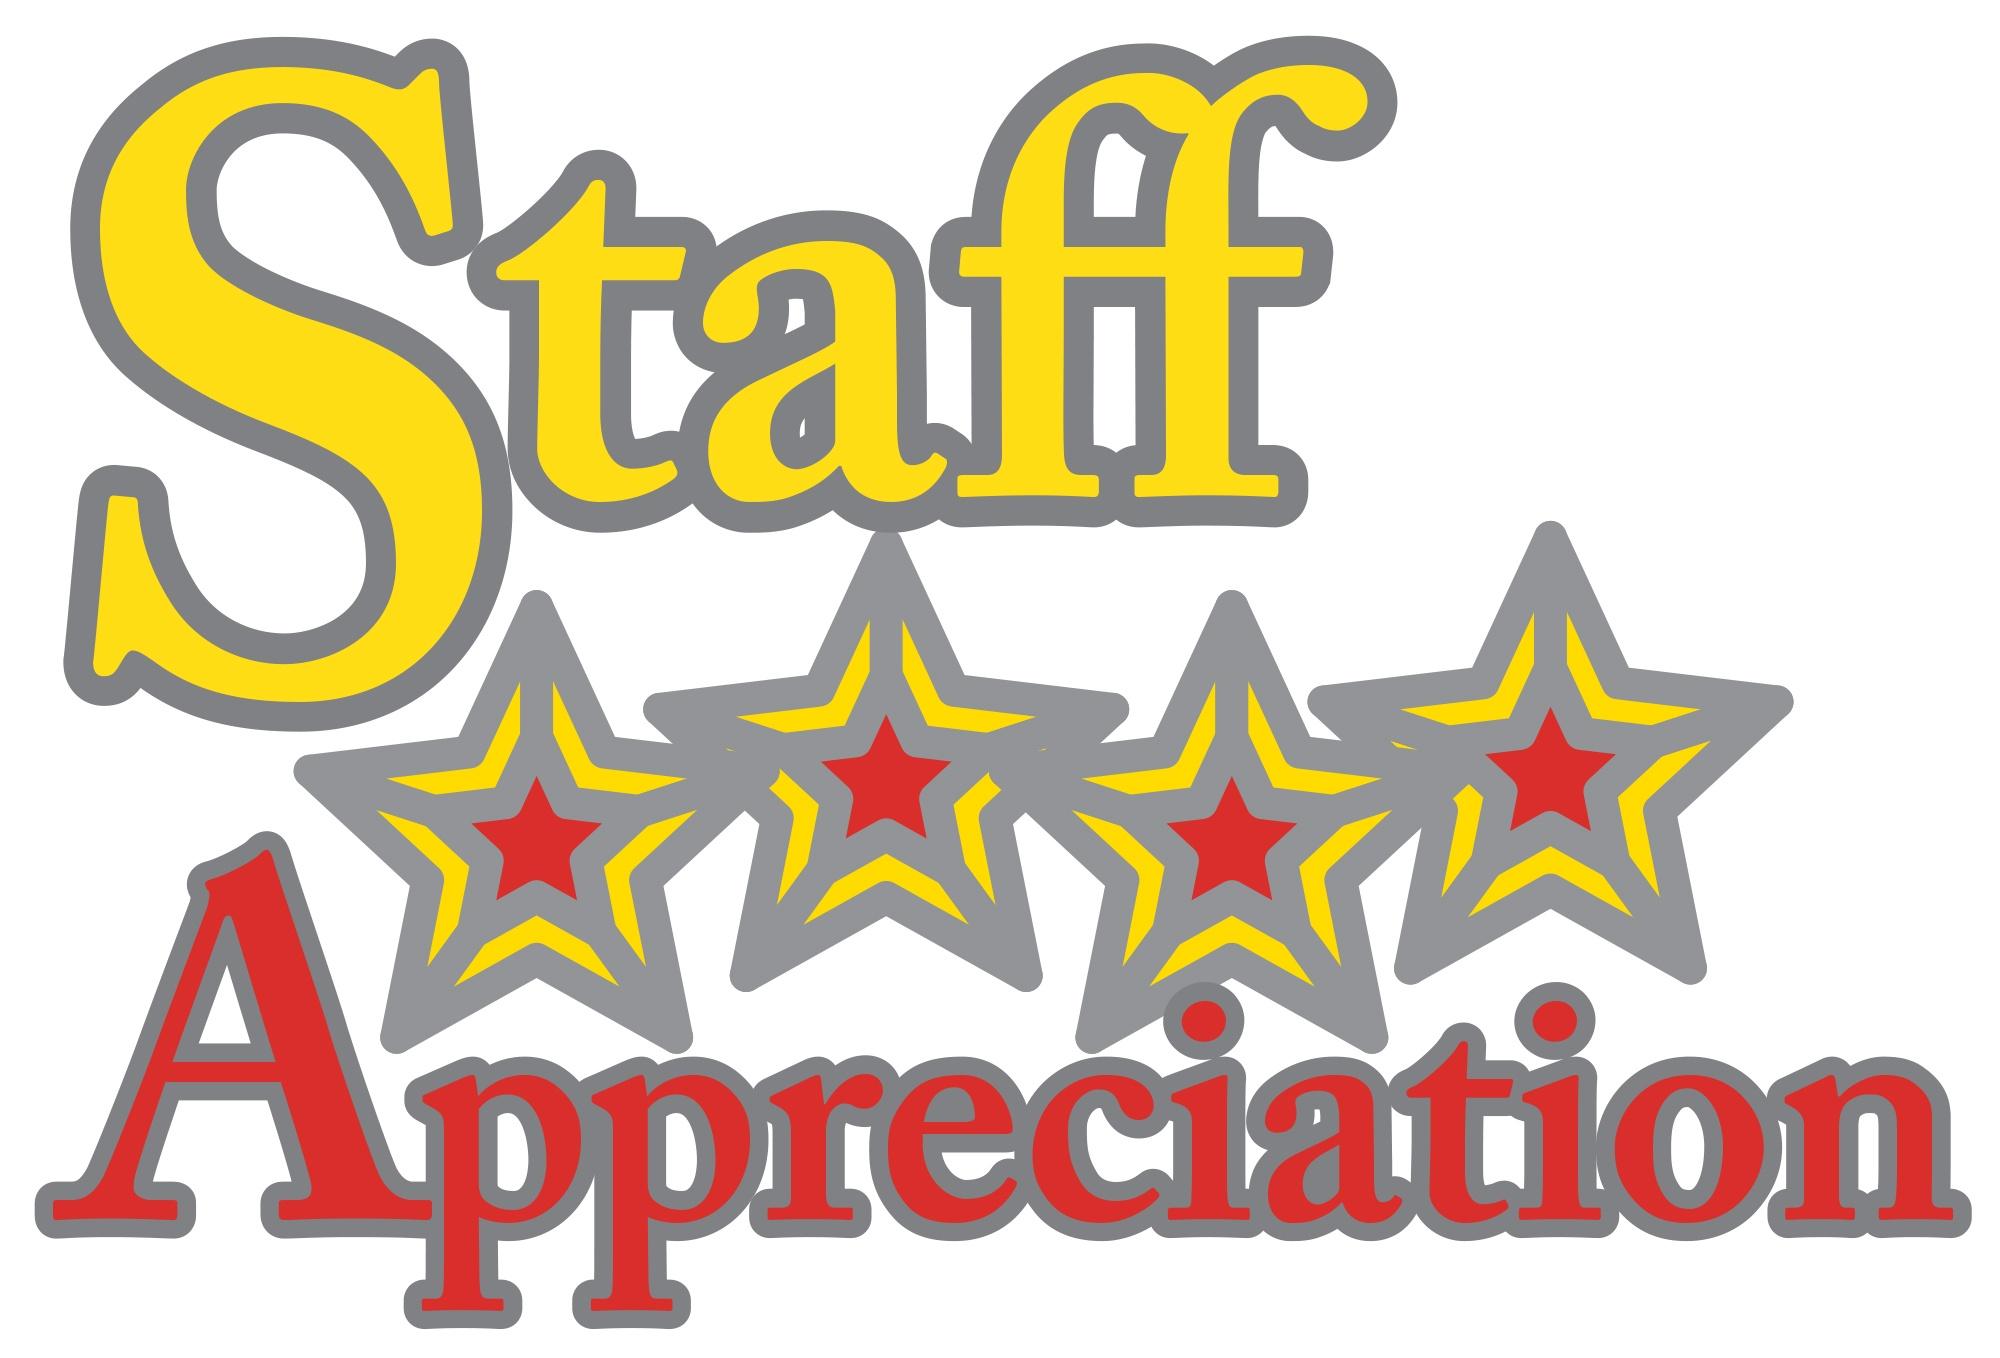 Appreciation clipart 8 » Clipart Station.